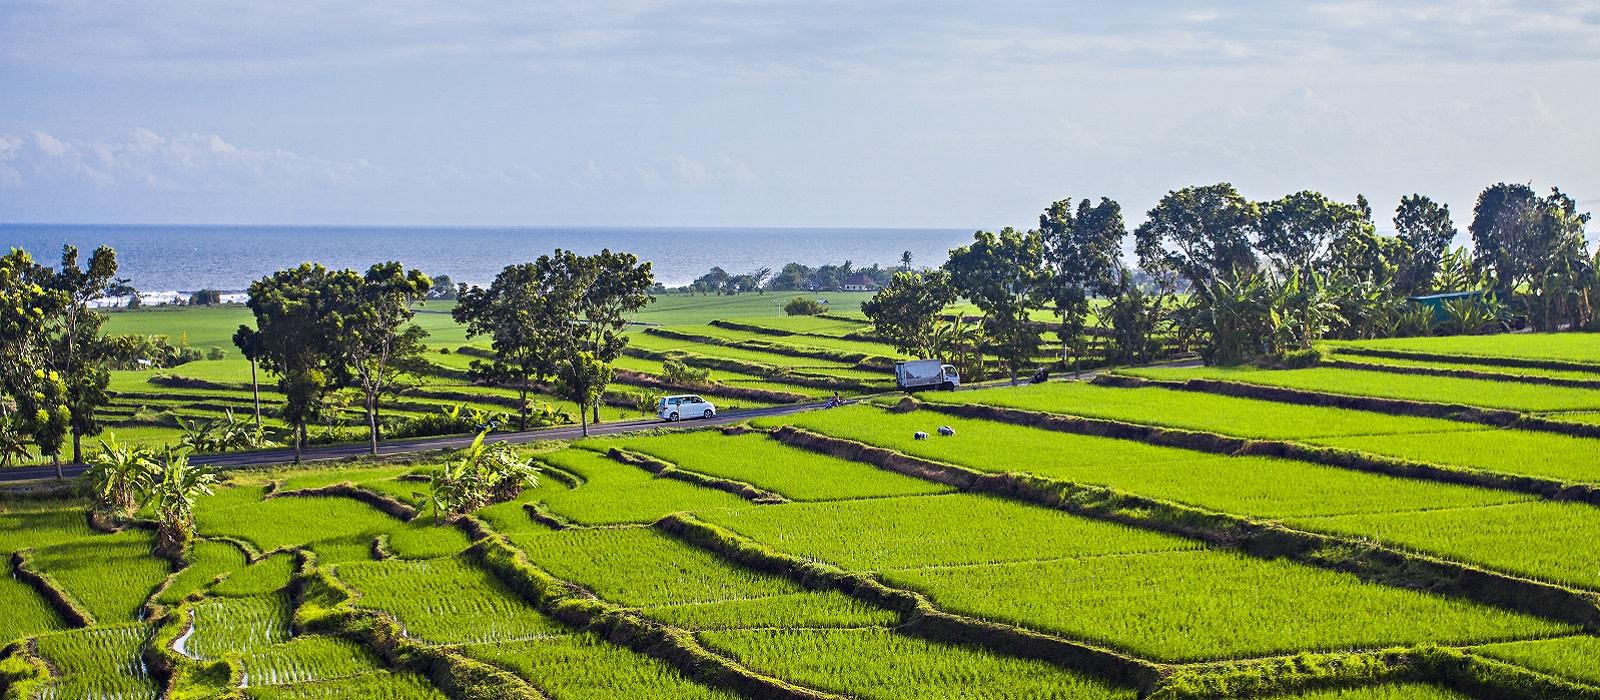 Reiseziel Bali,Jembrana Indonesien